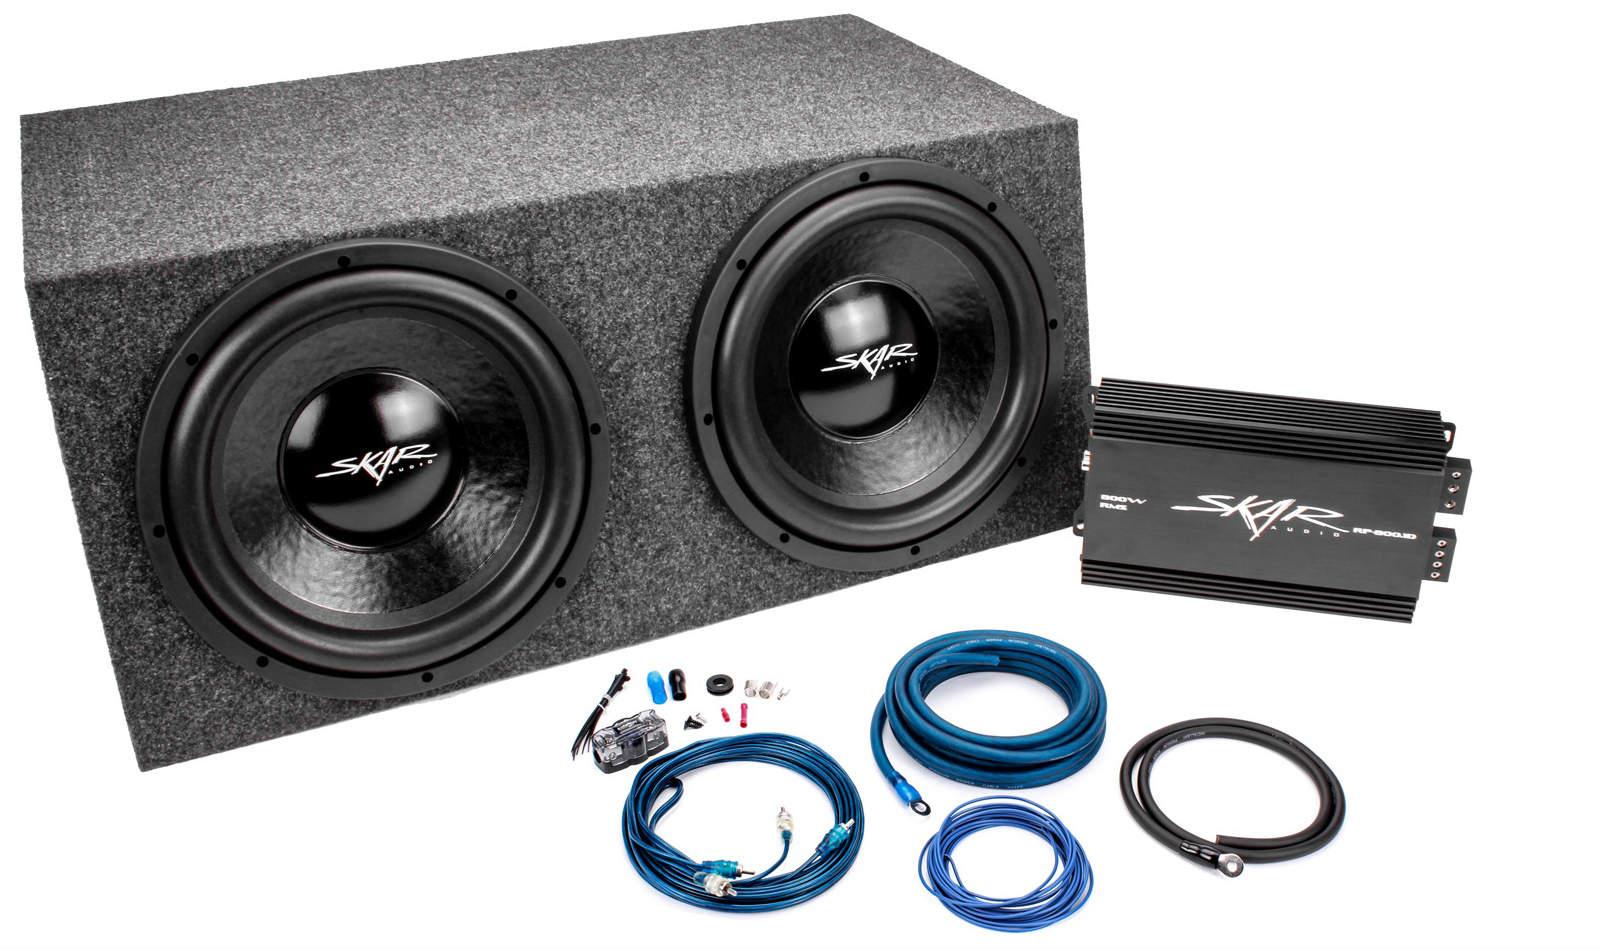 skar audio dual 12 quot 1000 watt ix series complete sub bass package with amplifier ebay